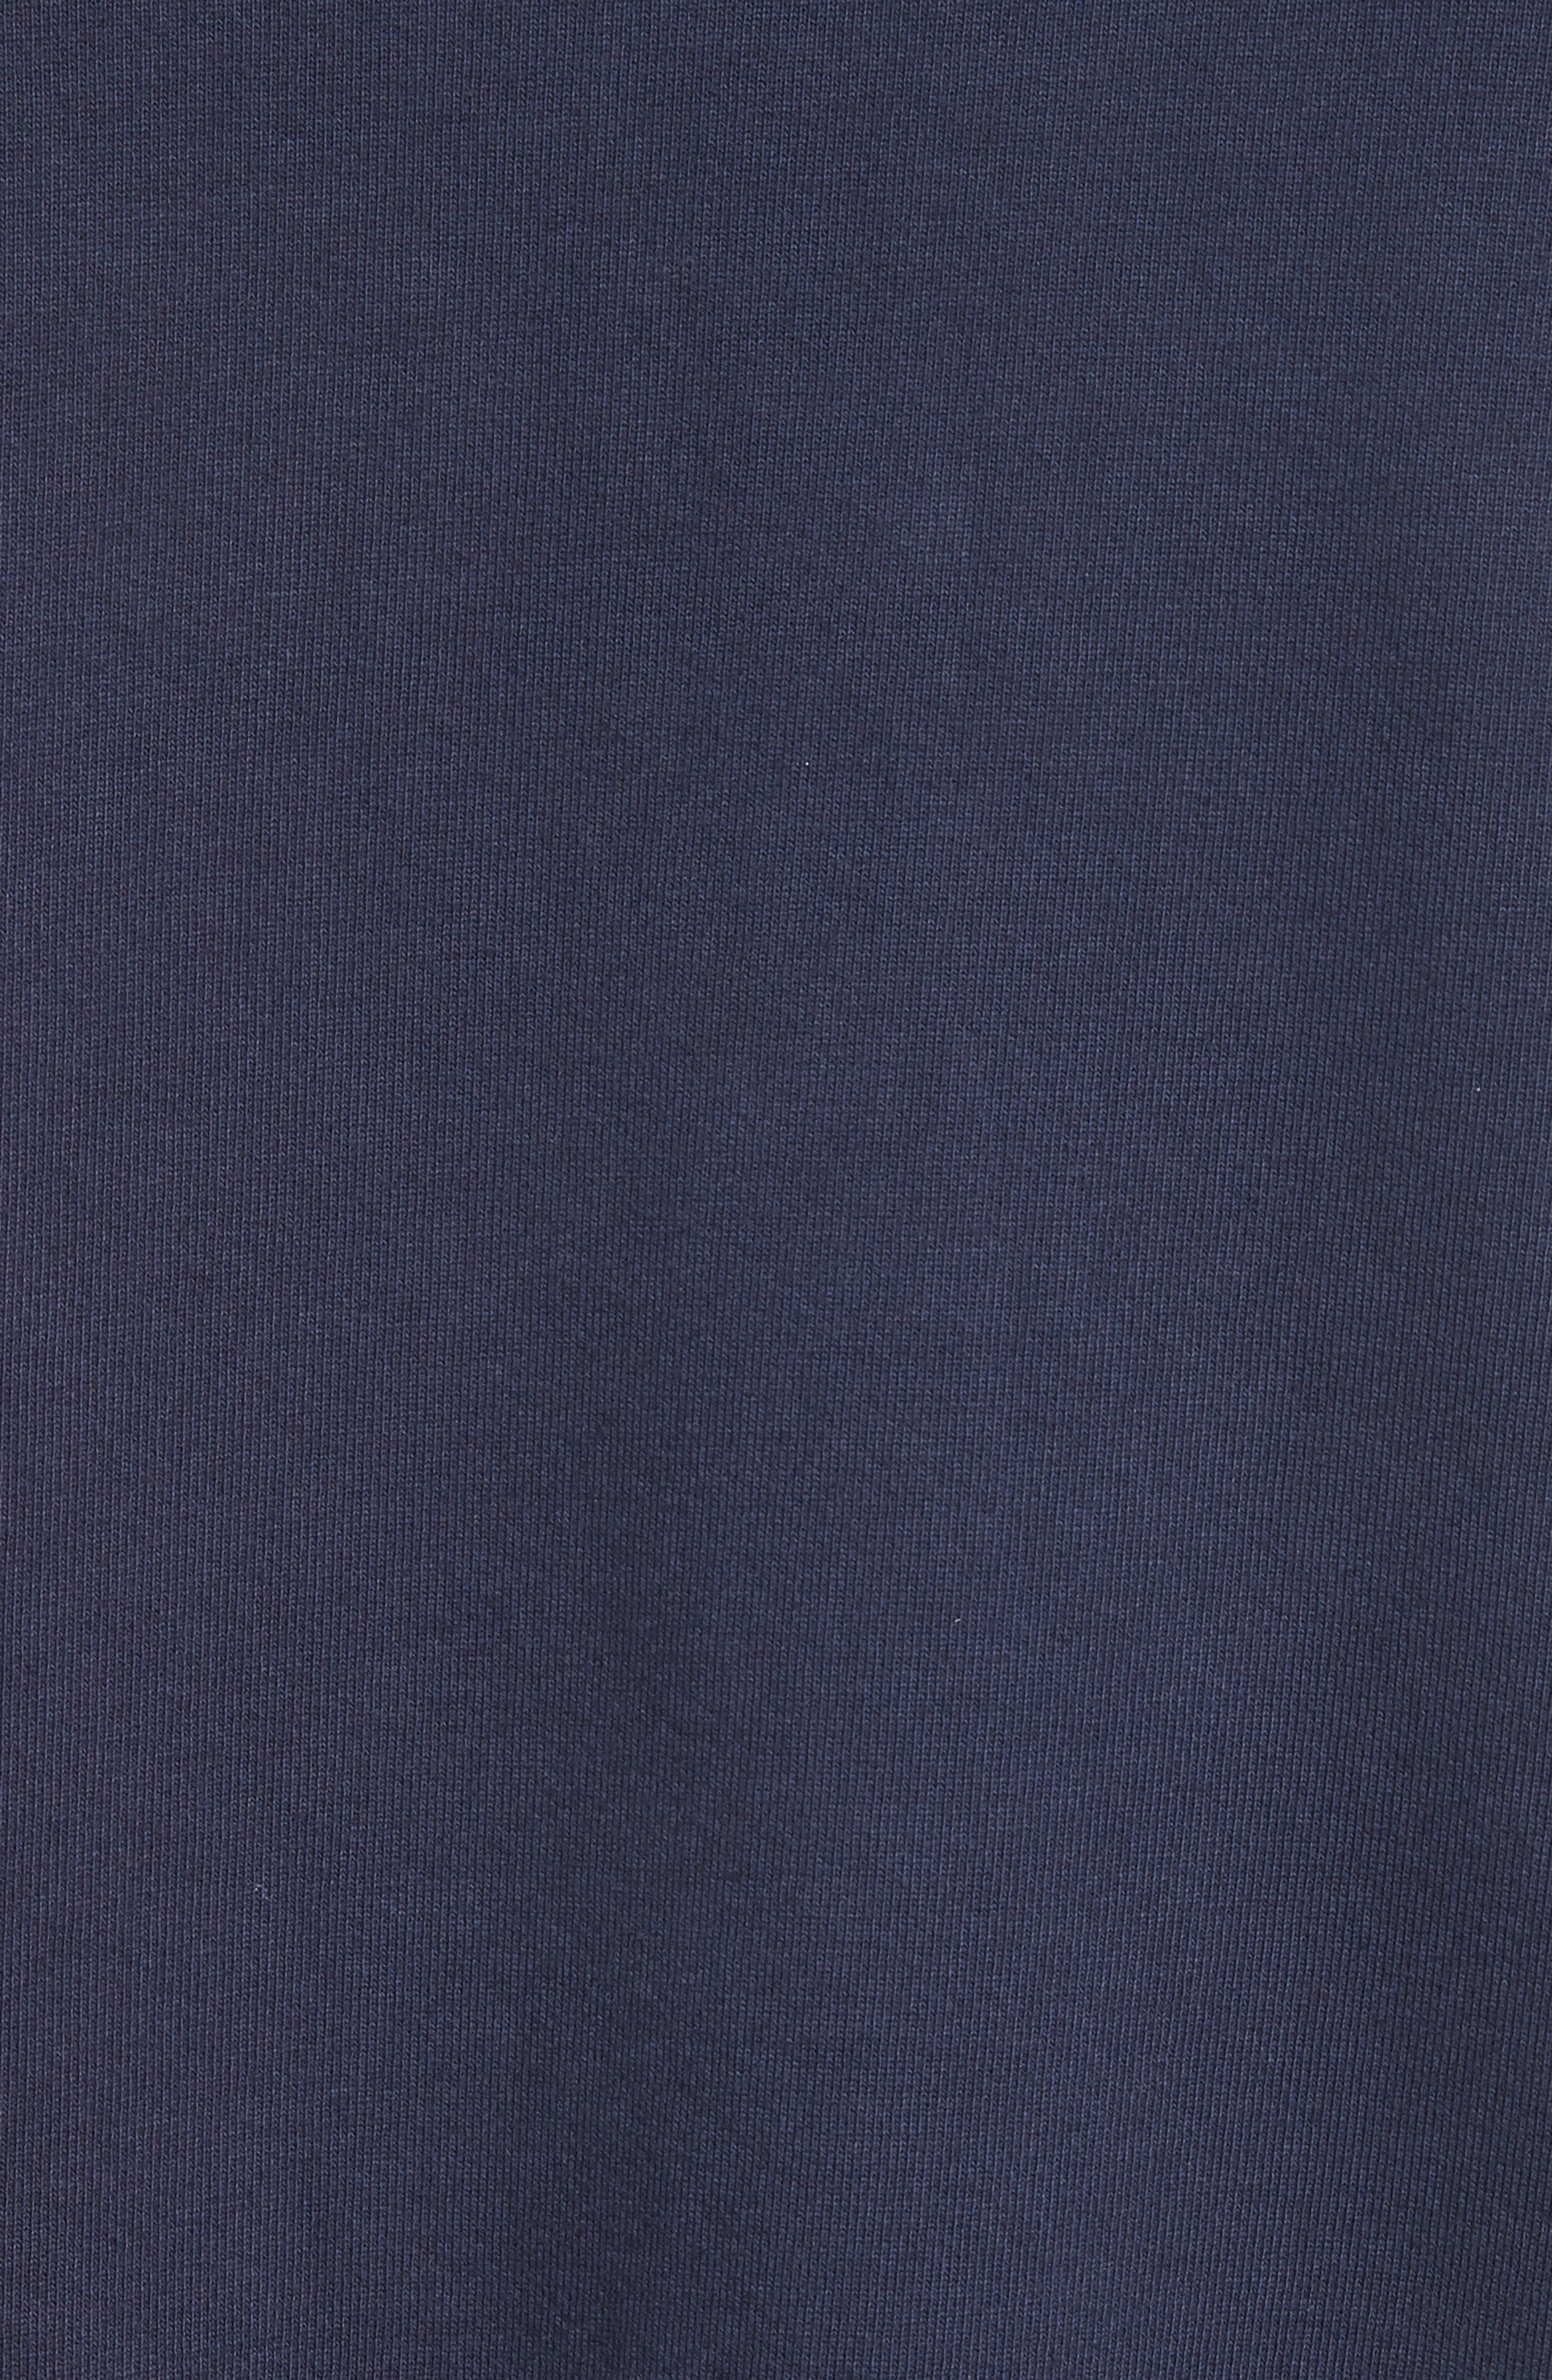 Alternate Image 5  - Drifter Galeras Velvet Sleeve Sweatshirt